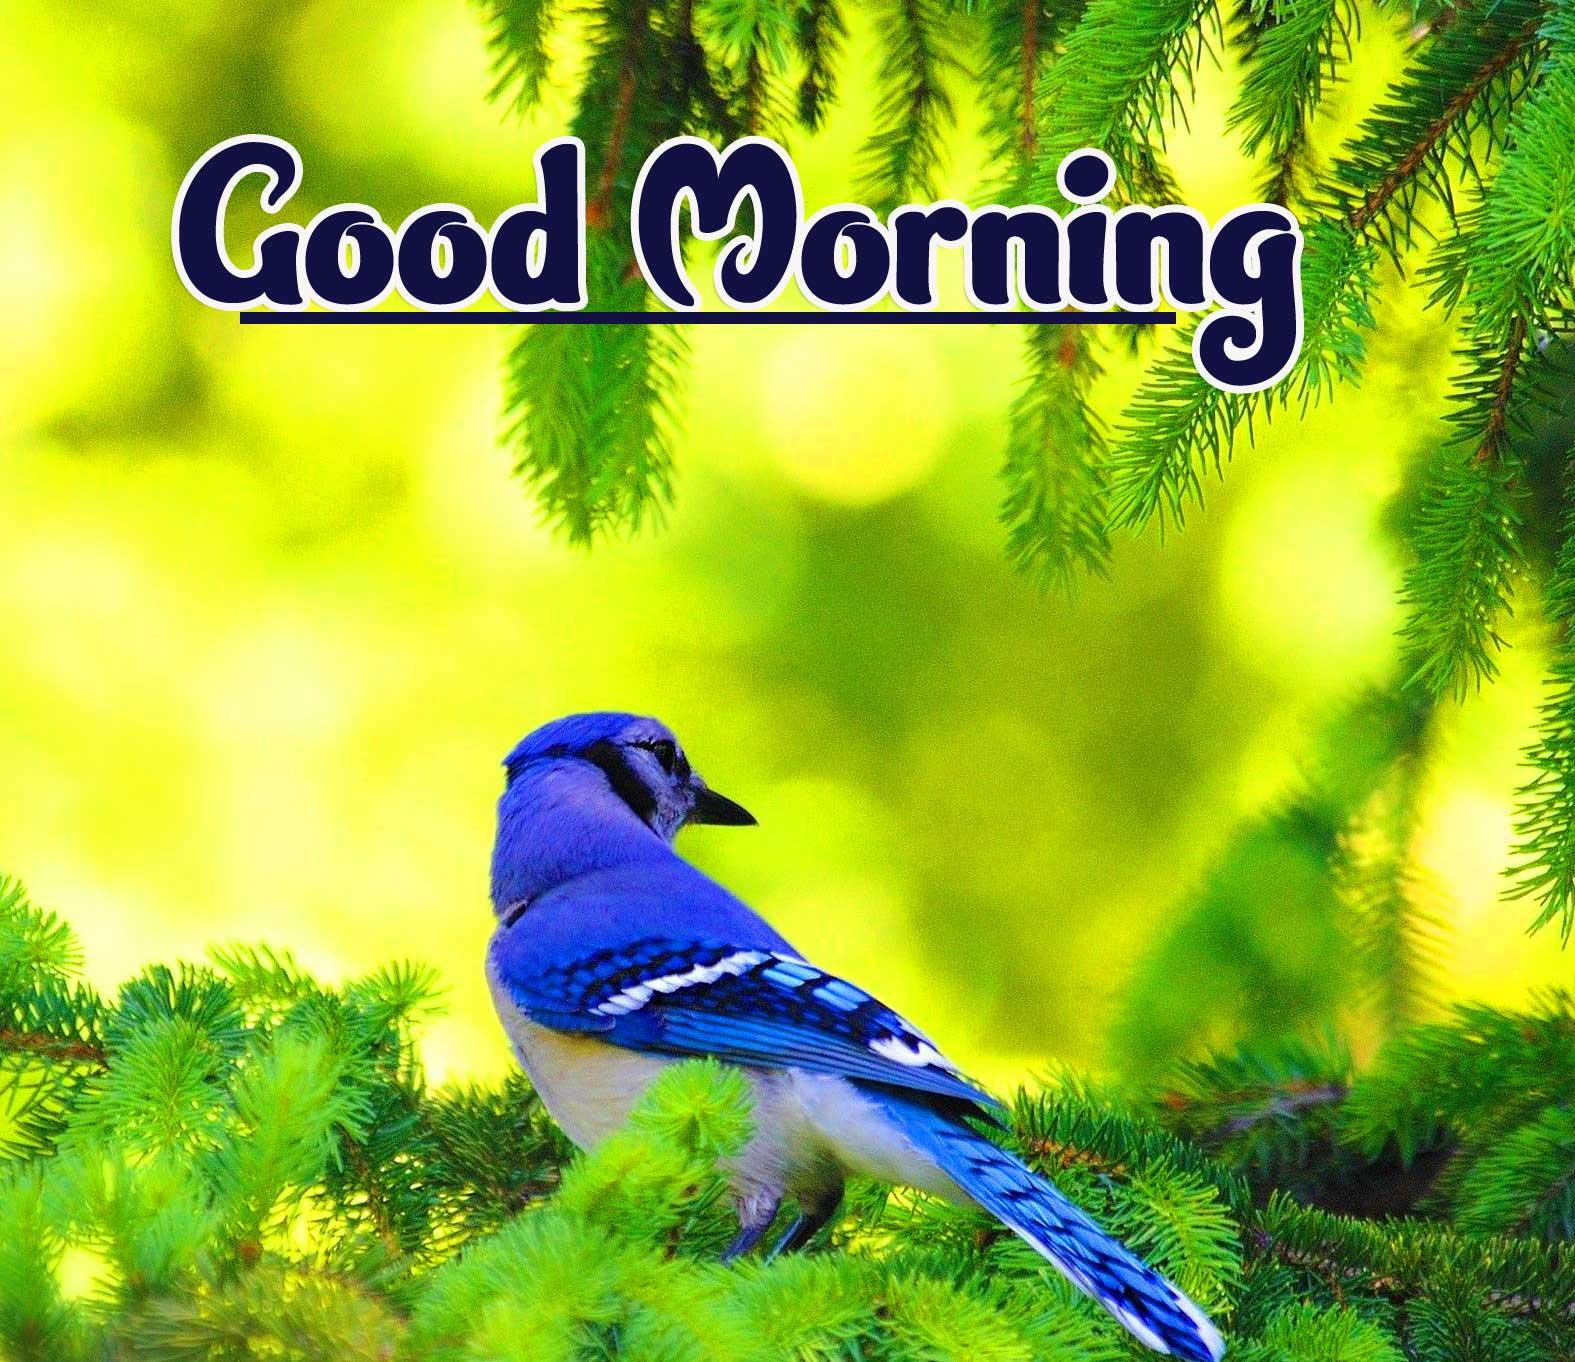 Good Morning Wallpaper Photo Pics Free Download